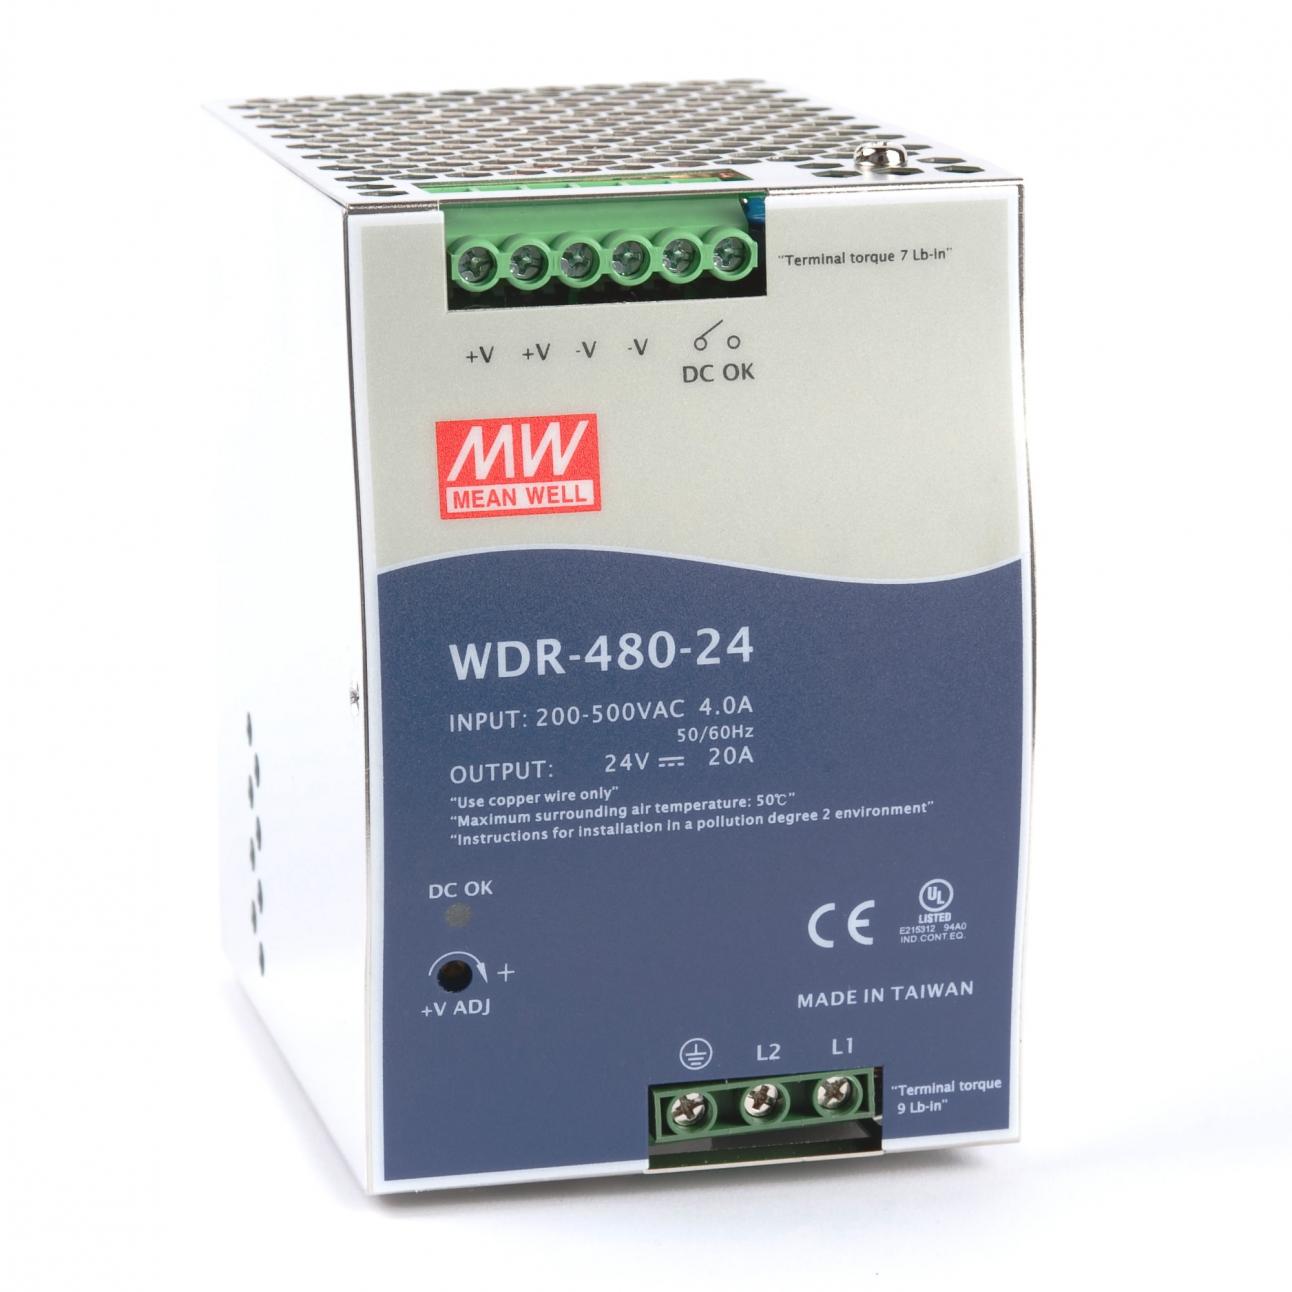 WDR-480-24 Блок питания на DIN-рейку, 24В, 20А, 480Вт Mean Well